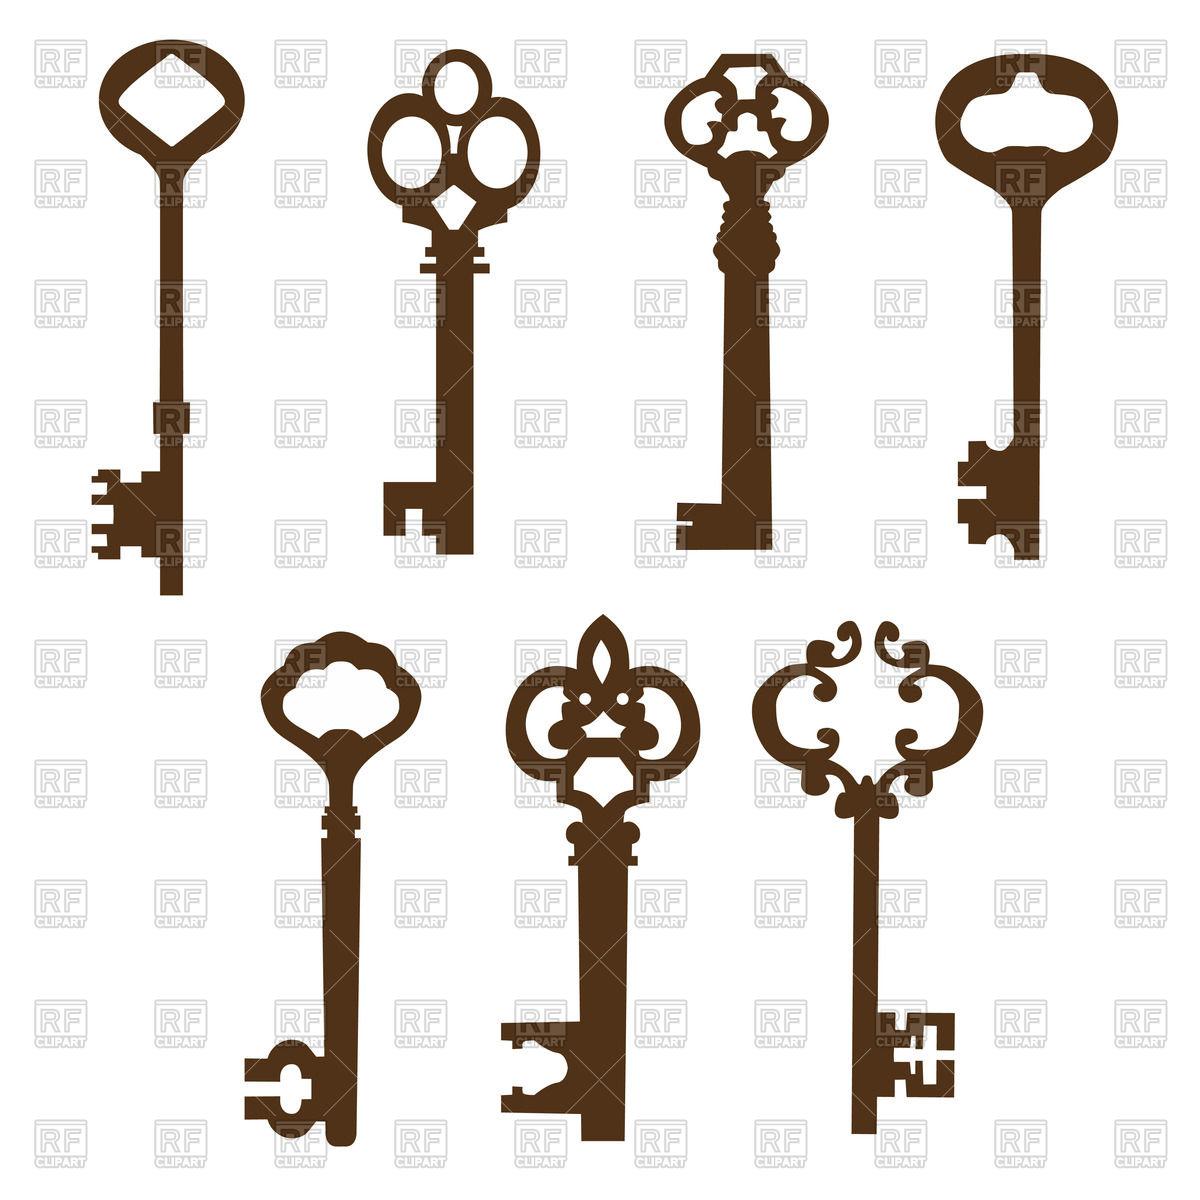 Silhouettes of vintage door keys with ornate handles Vector Image.